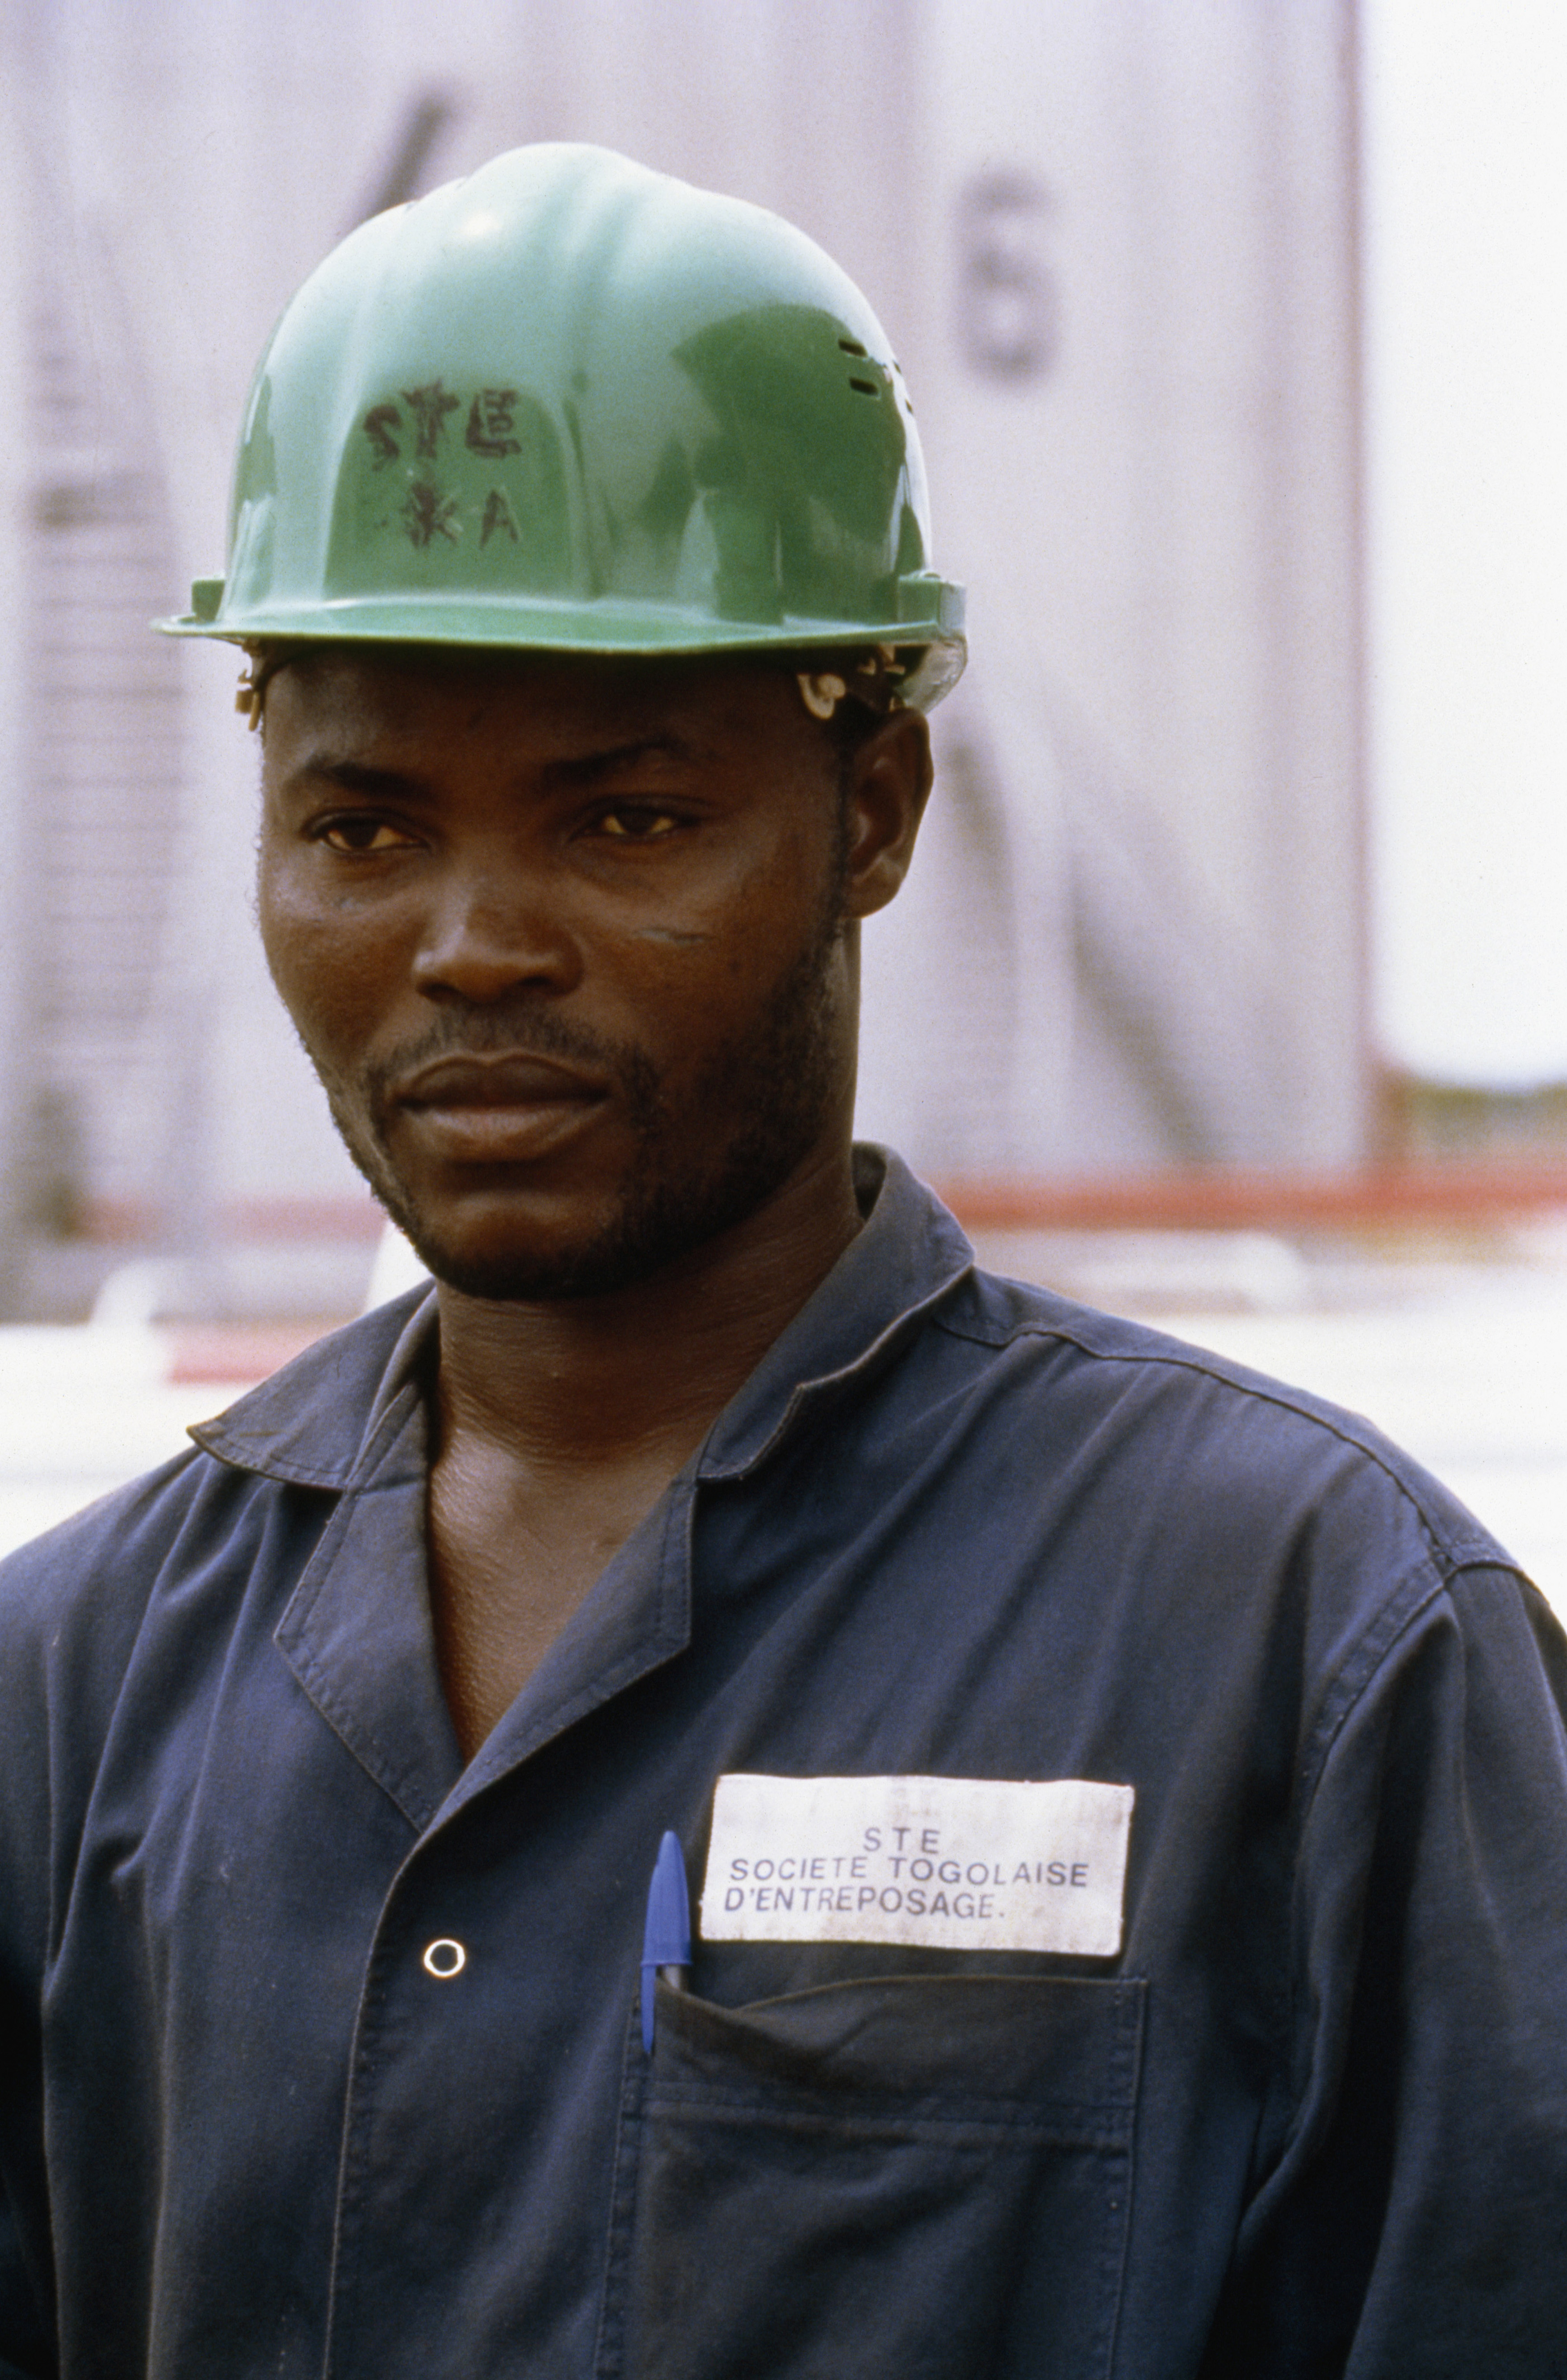 Ravvedimento per i lavoratori stranieri irregolari